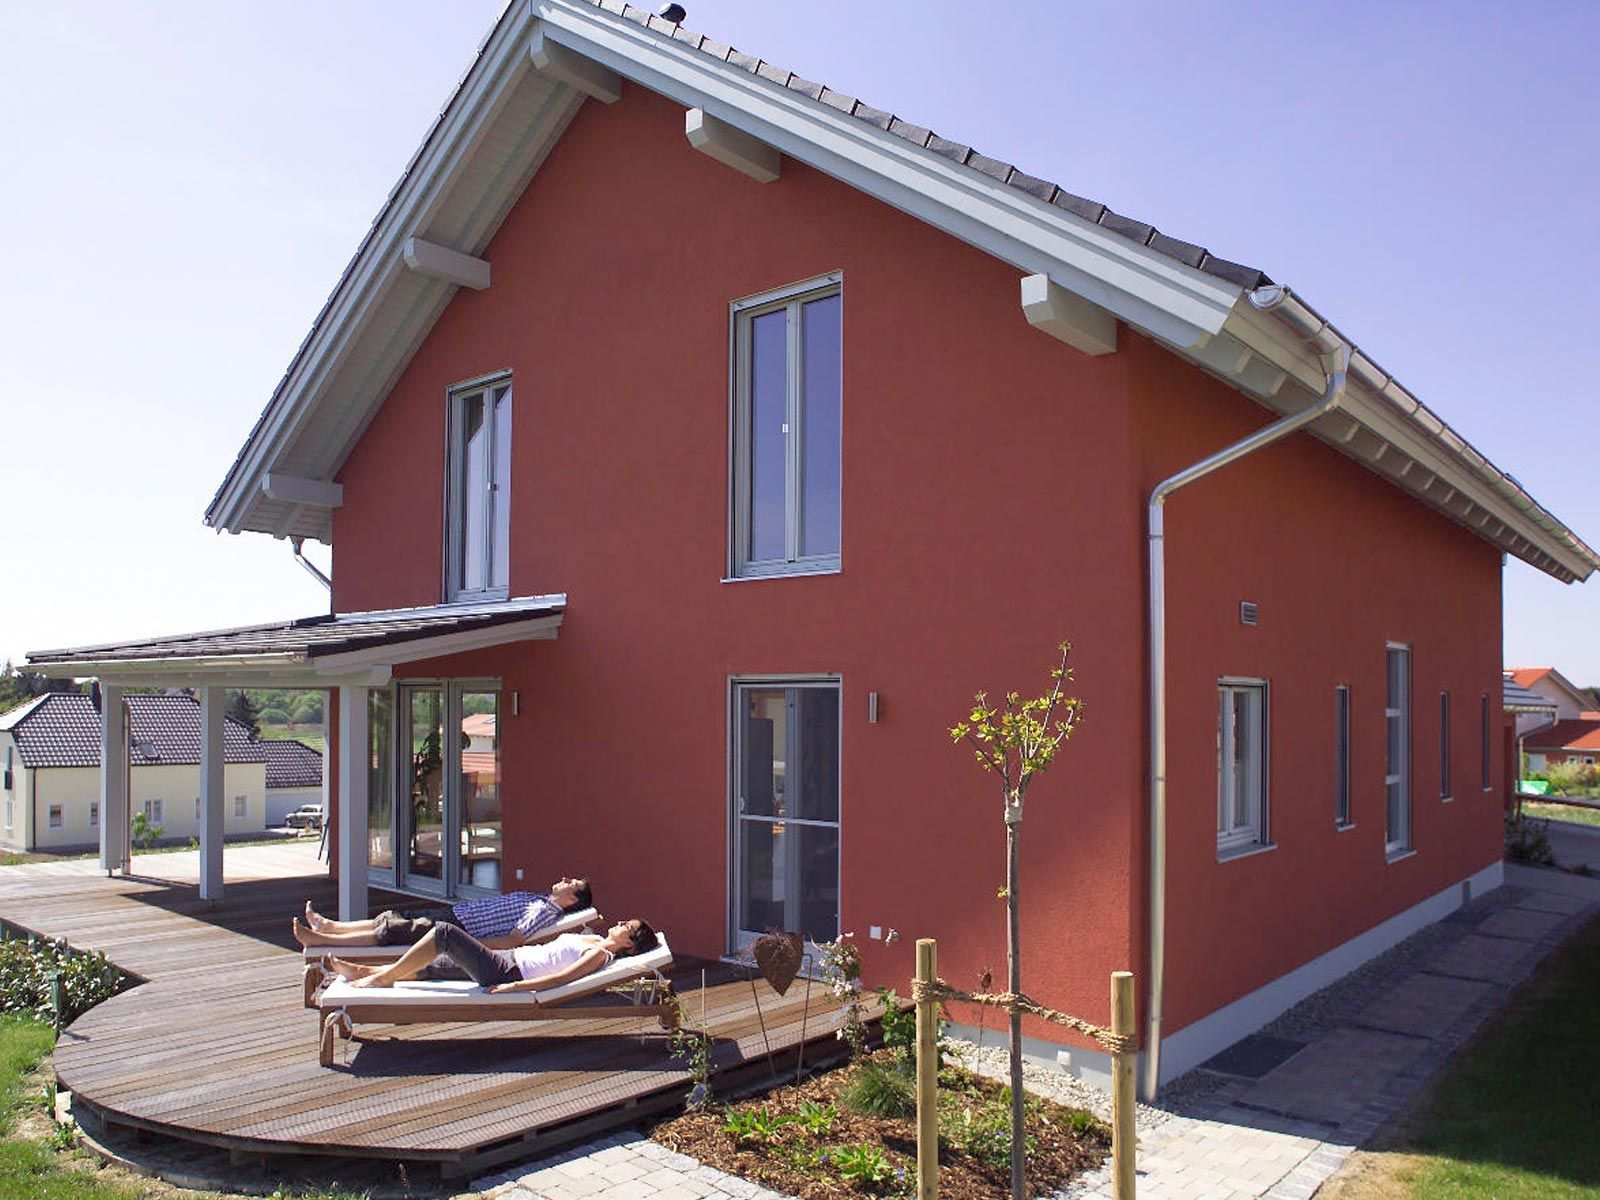 Individuell geplantes kundenhaus kohaus musterhaus for Energiesparendes bauen